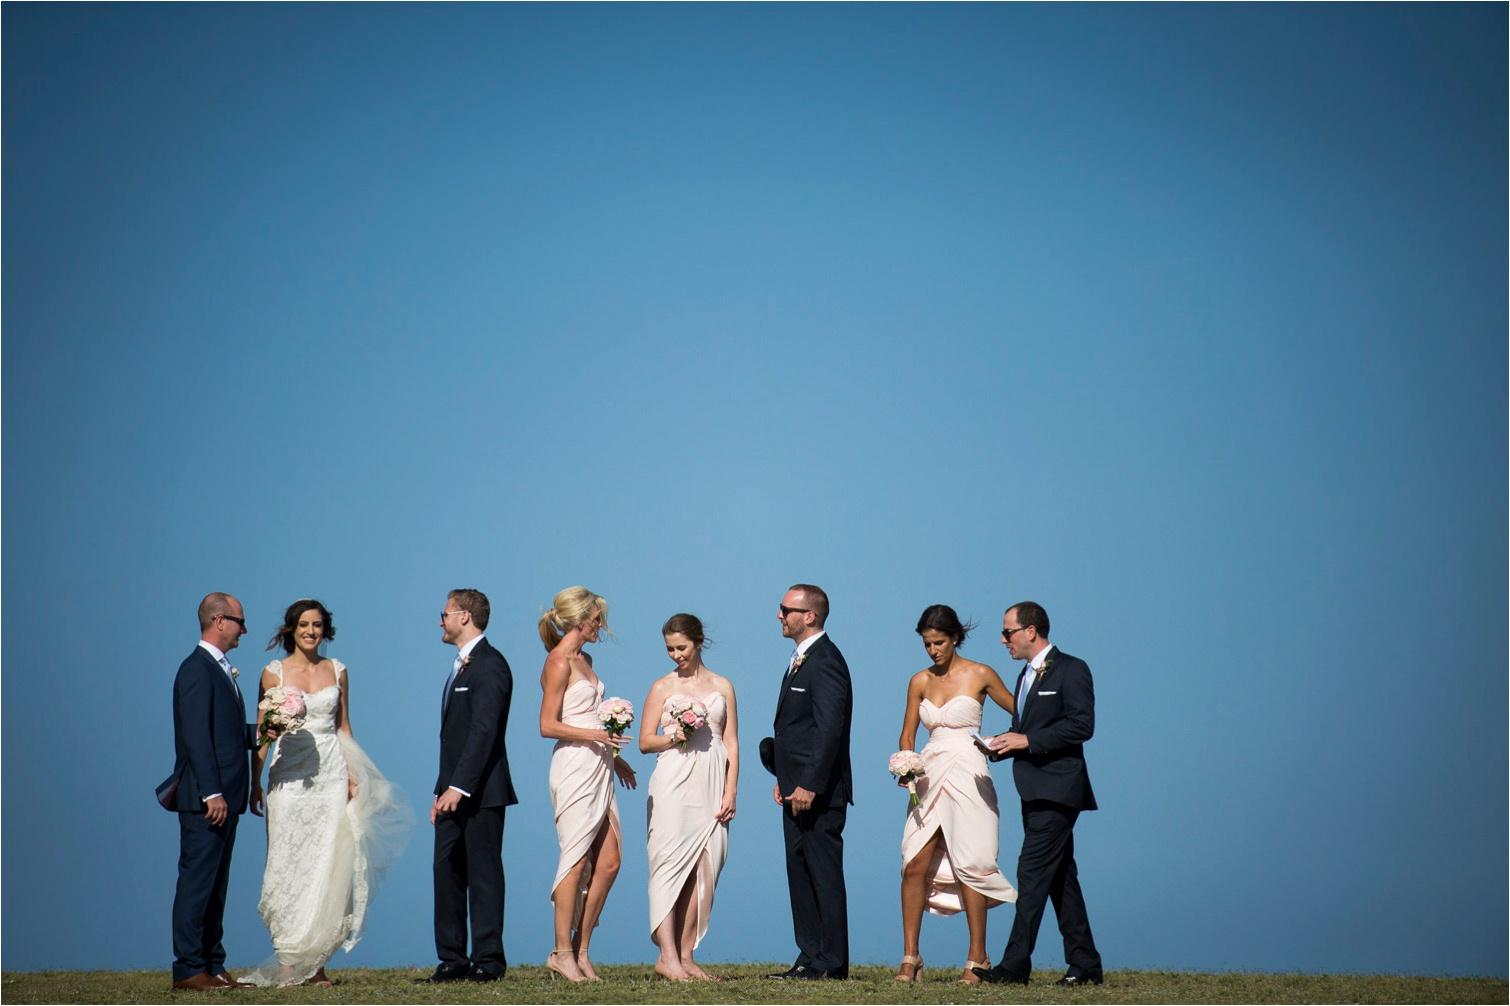 Nicole&Carlie_Watsons_Bay_Hotel_Wedding_by_Gold_Coast_Photographers-The_Follans26.jpg